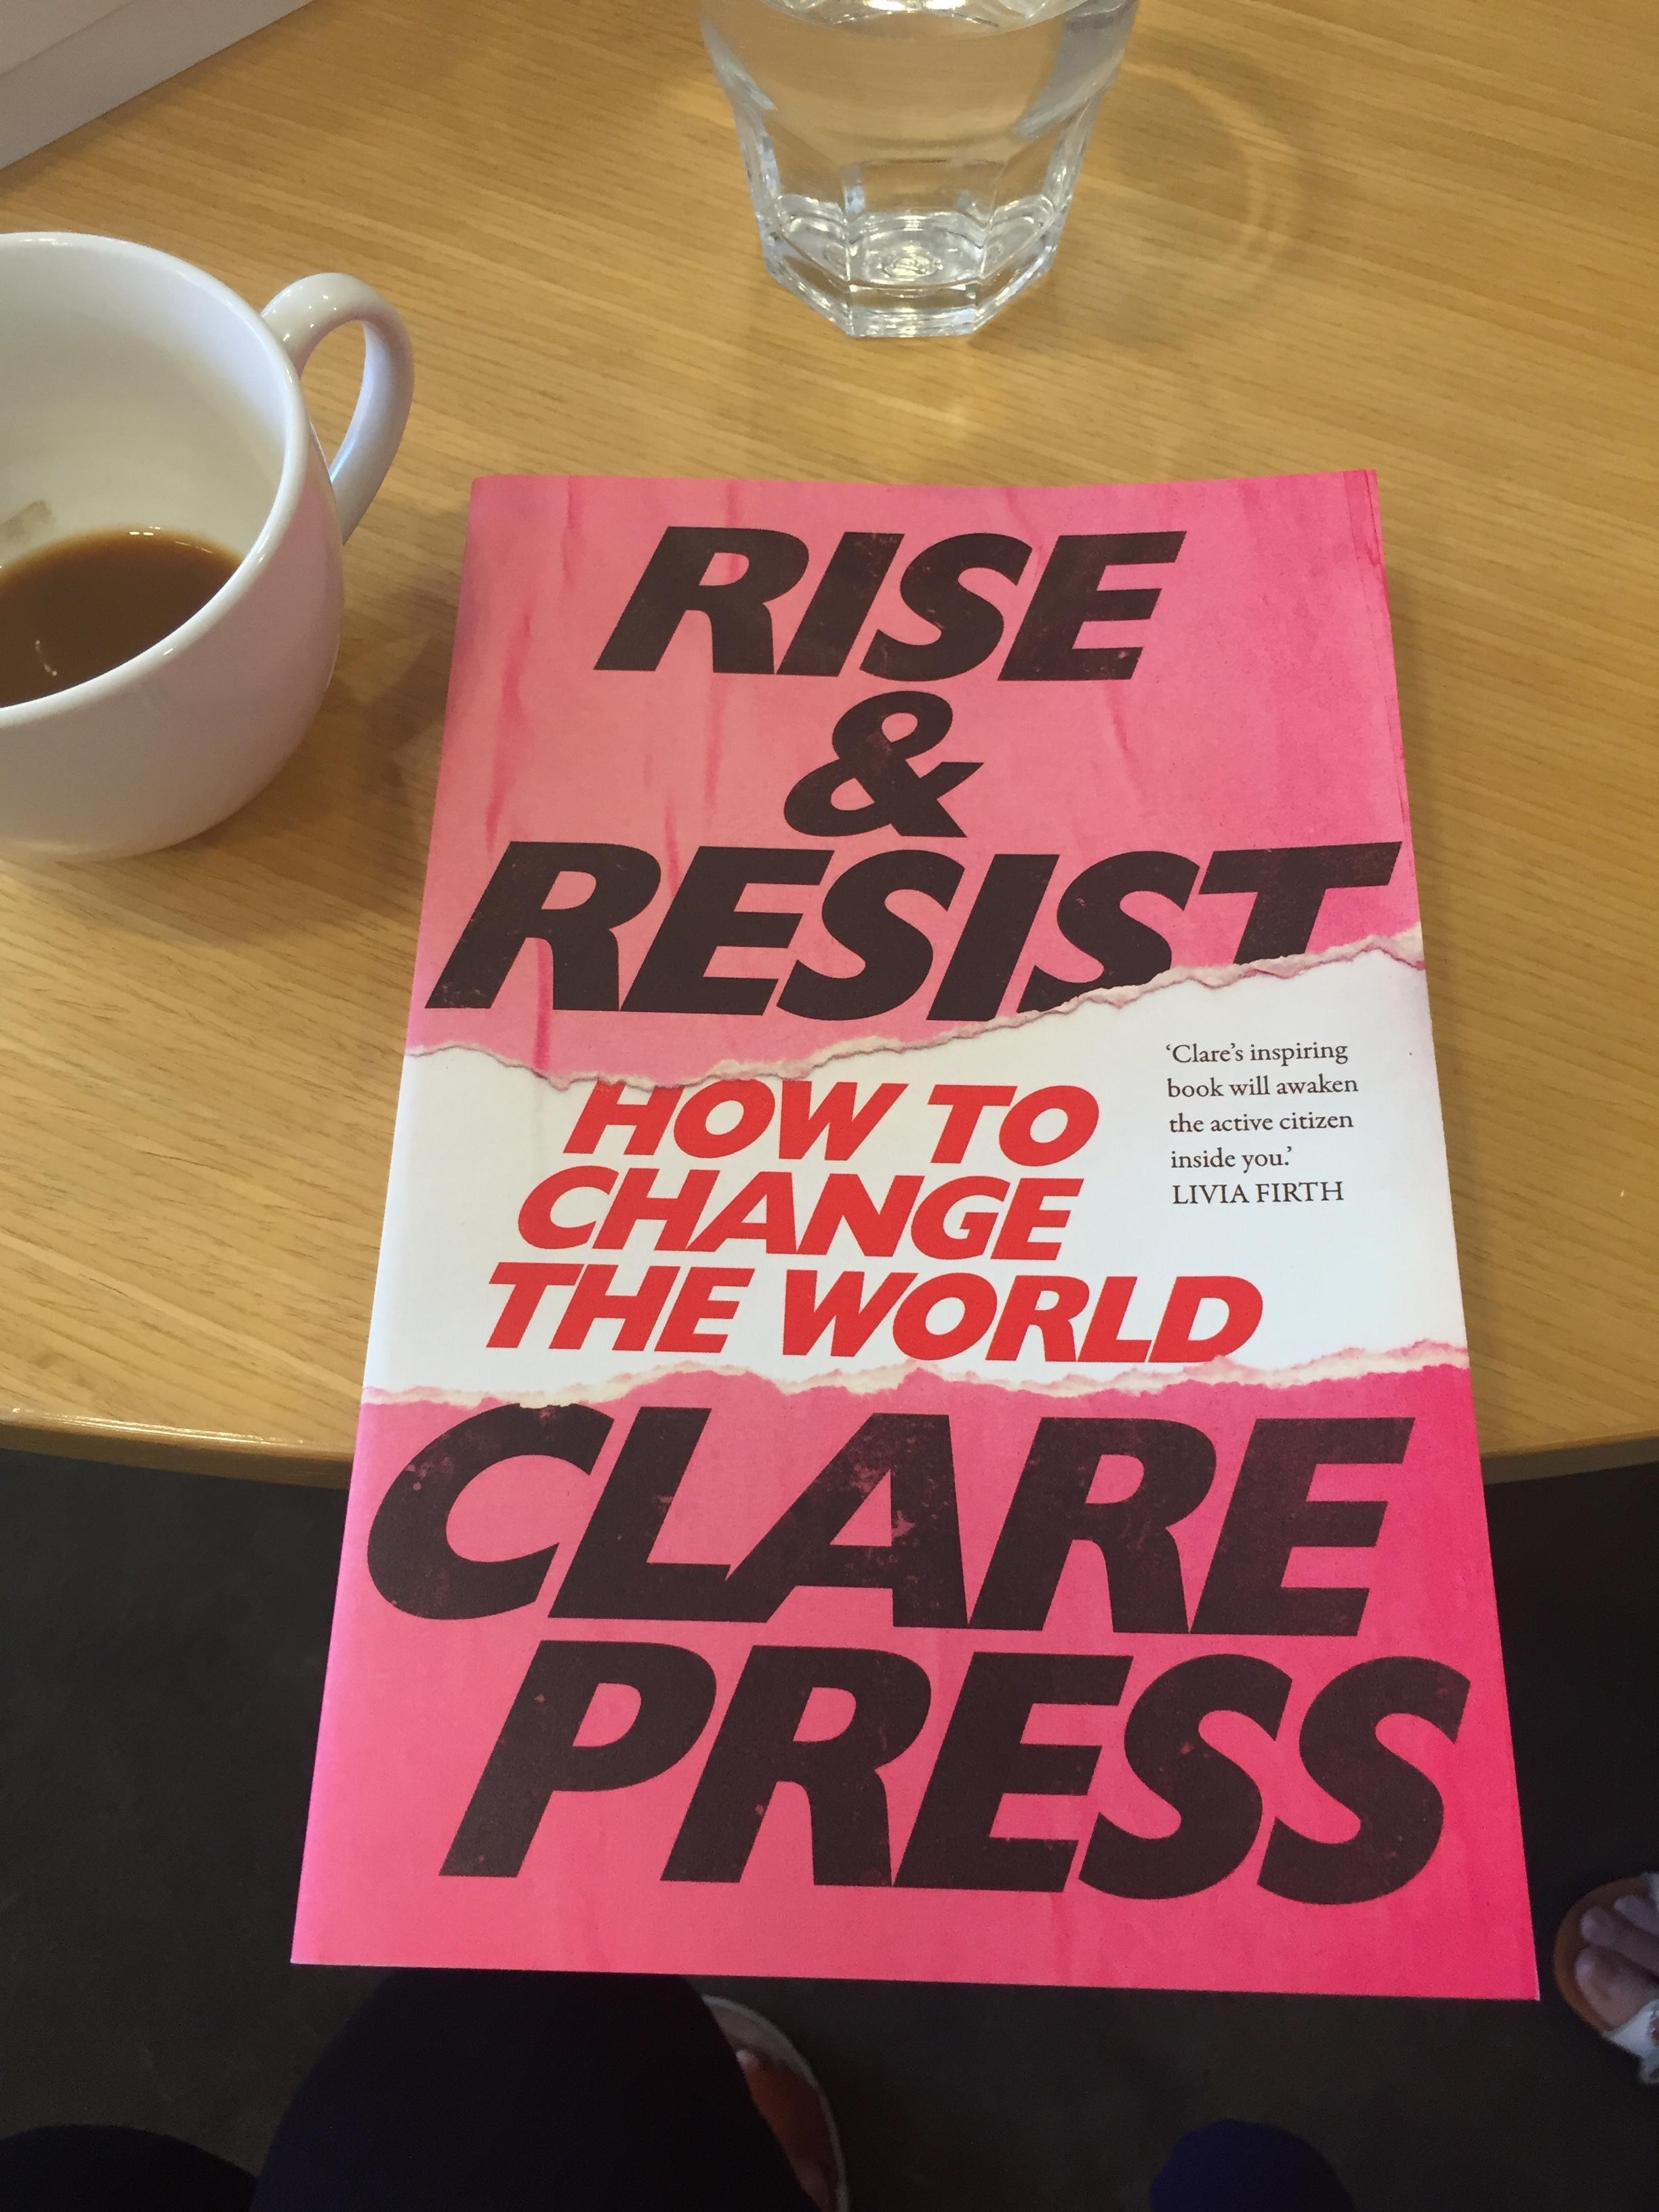 Clare_Press_Rise&Resist_AFC.jpeg